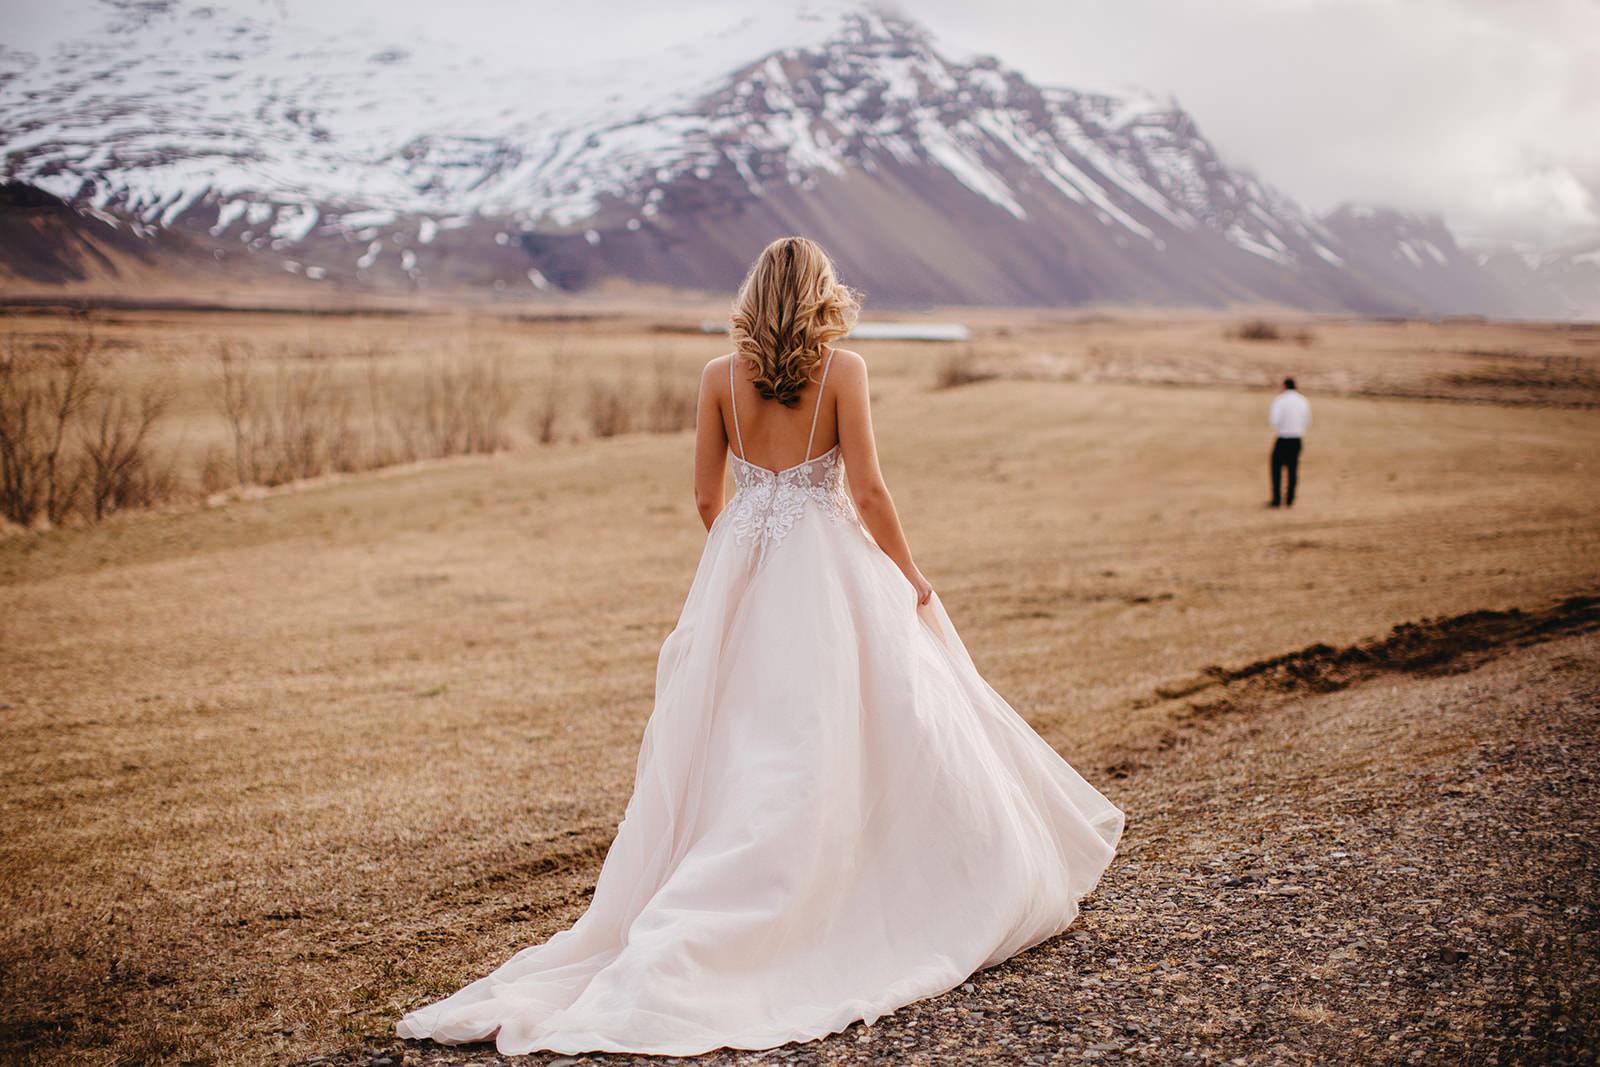 Icelandic Iceland Elopement Wedding Elope Photographer Eloping Reykjavík Vik Black Sand Beach Jökulsárlón Skogafoss Waterfall Vestrahorn Mountain Liz Osban Photography Destination 14.jpg